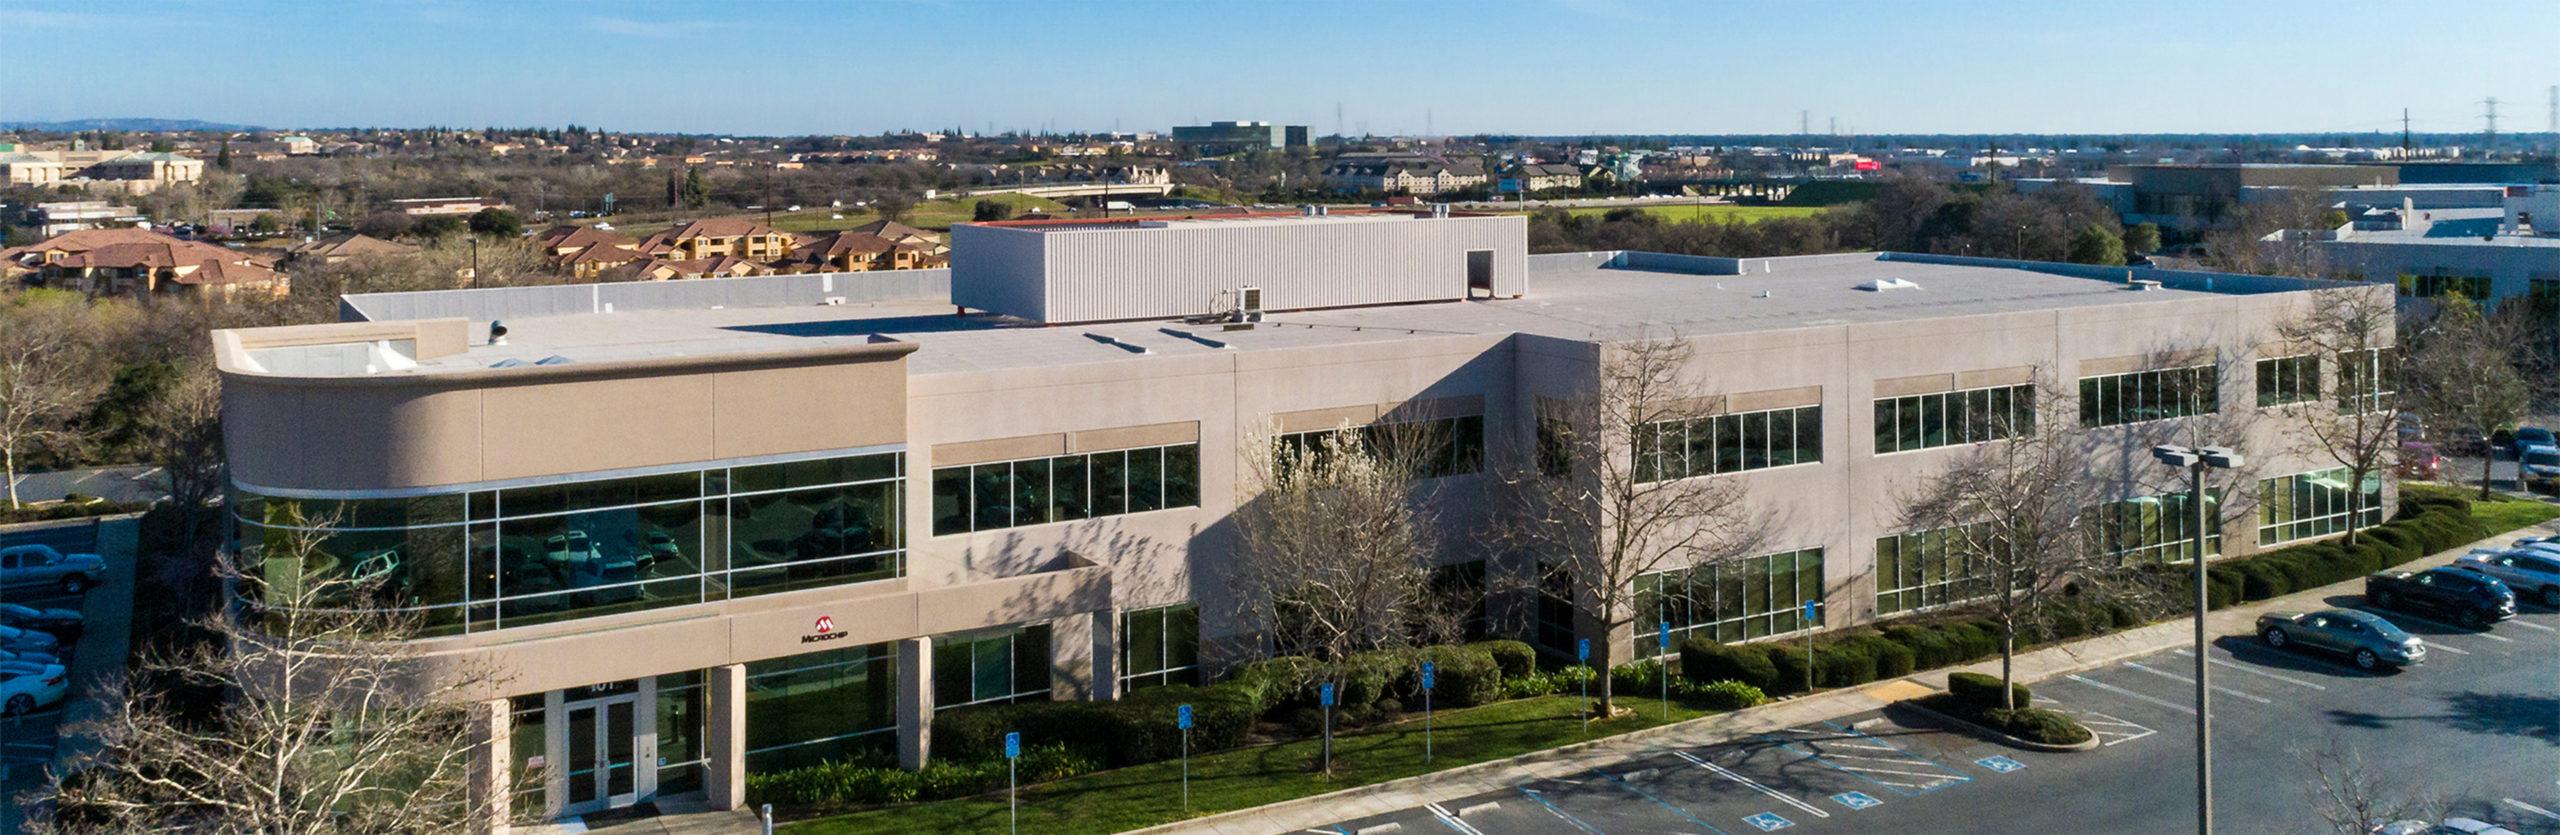 The Studio Coworking - Creekside Roseville - Location - Building Exterior